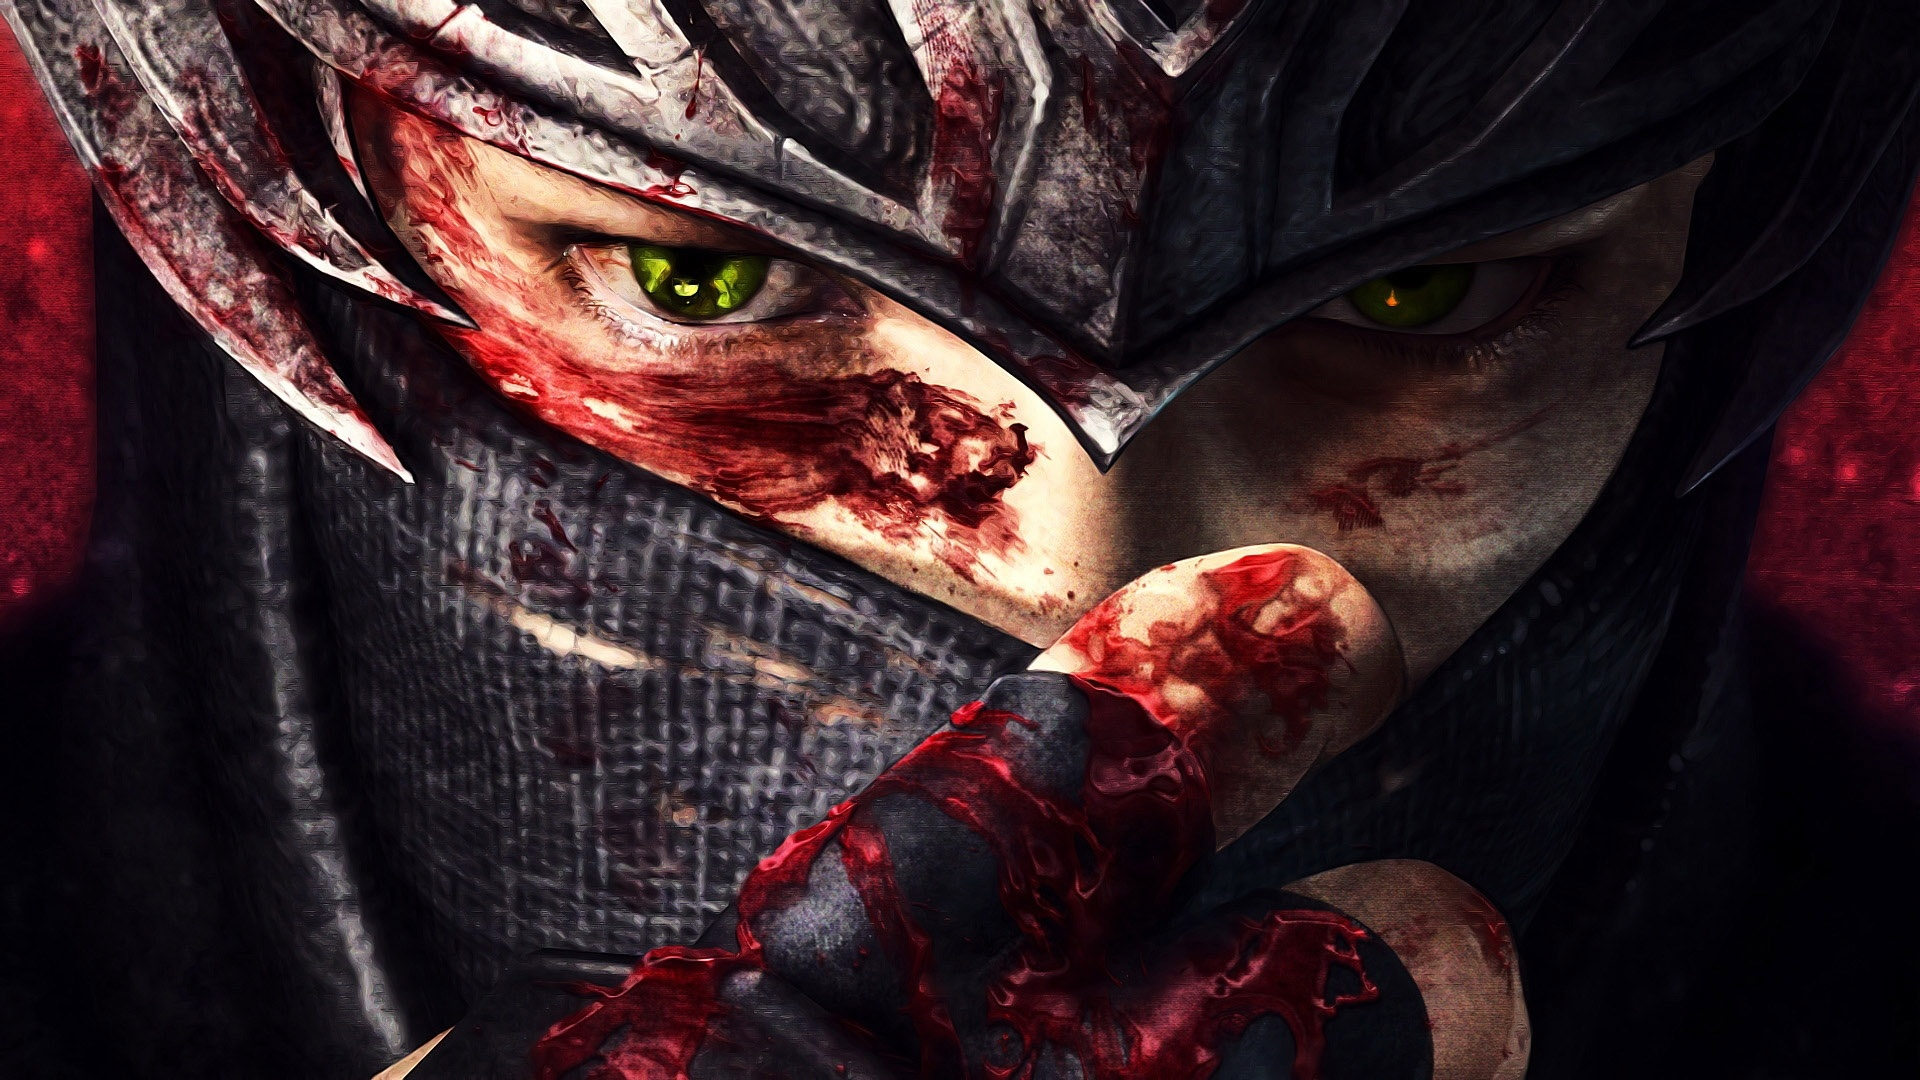 Danger 3d Wallpaper Download Ninja Gaiden Fantasy Anime Warrior Blood Mask G Wallpaper